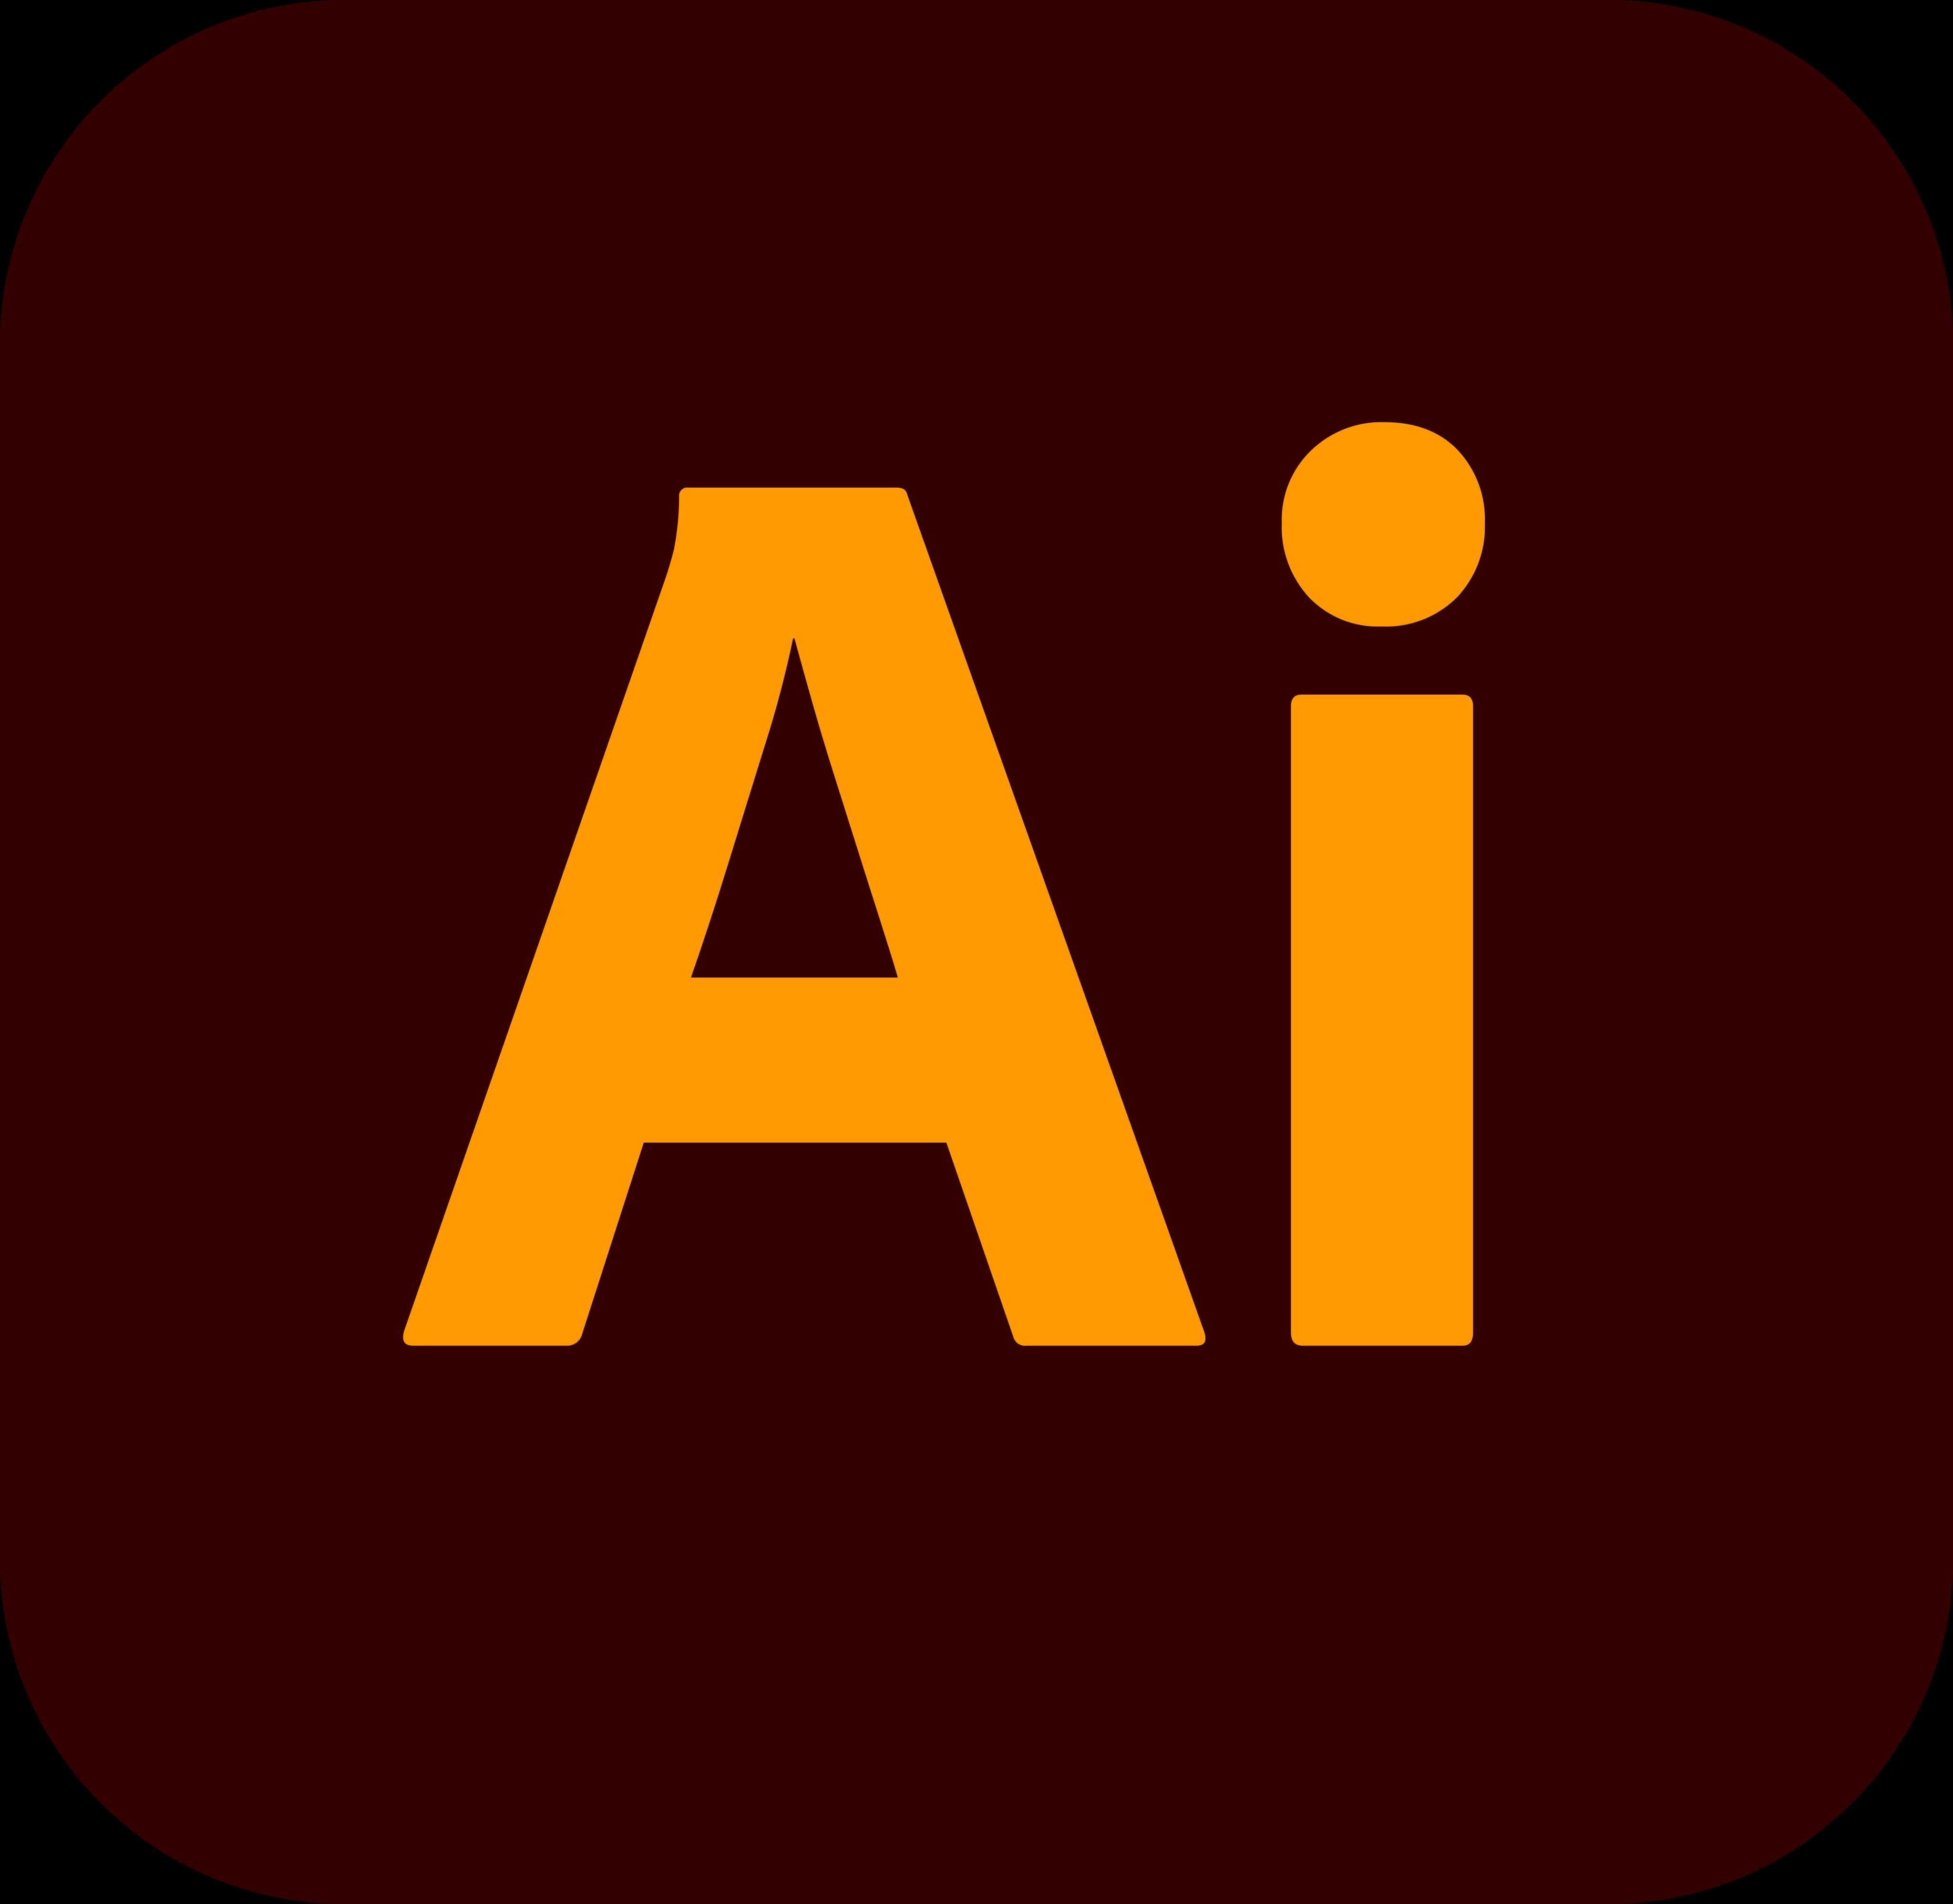 adobe Illustrator logo 5 - Adobe Illustrator Logo